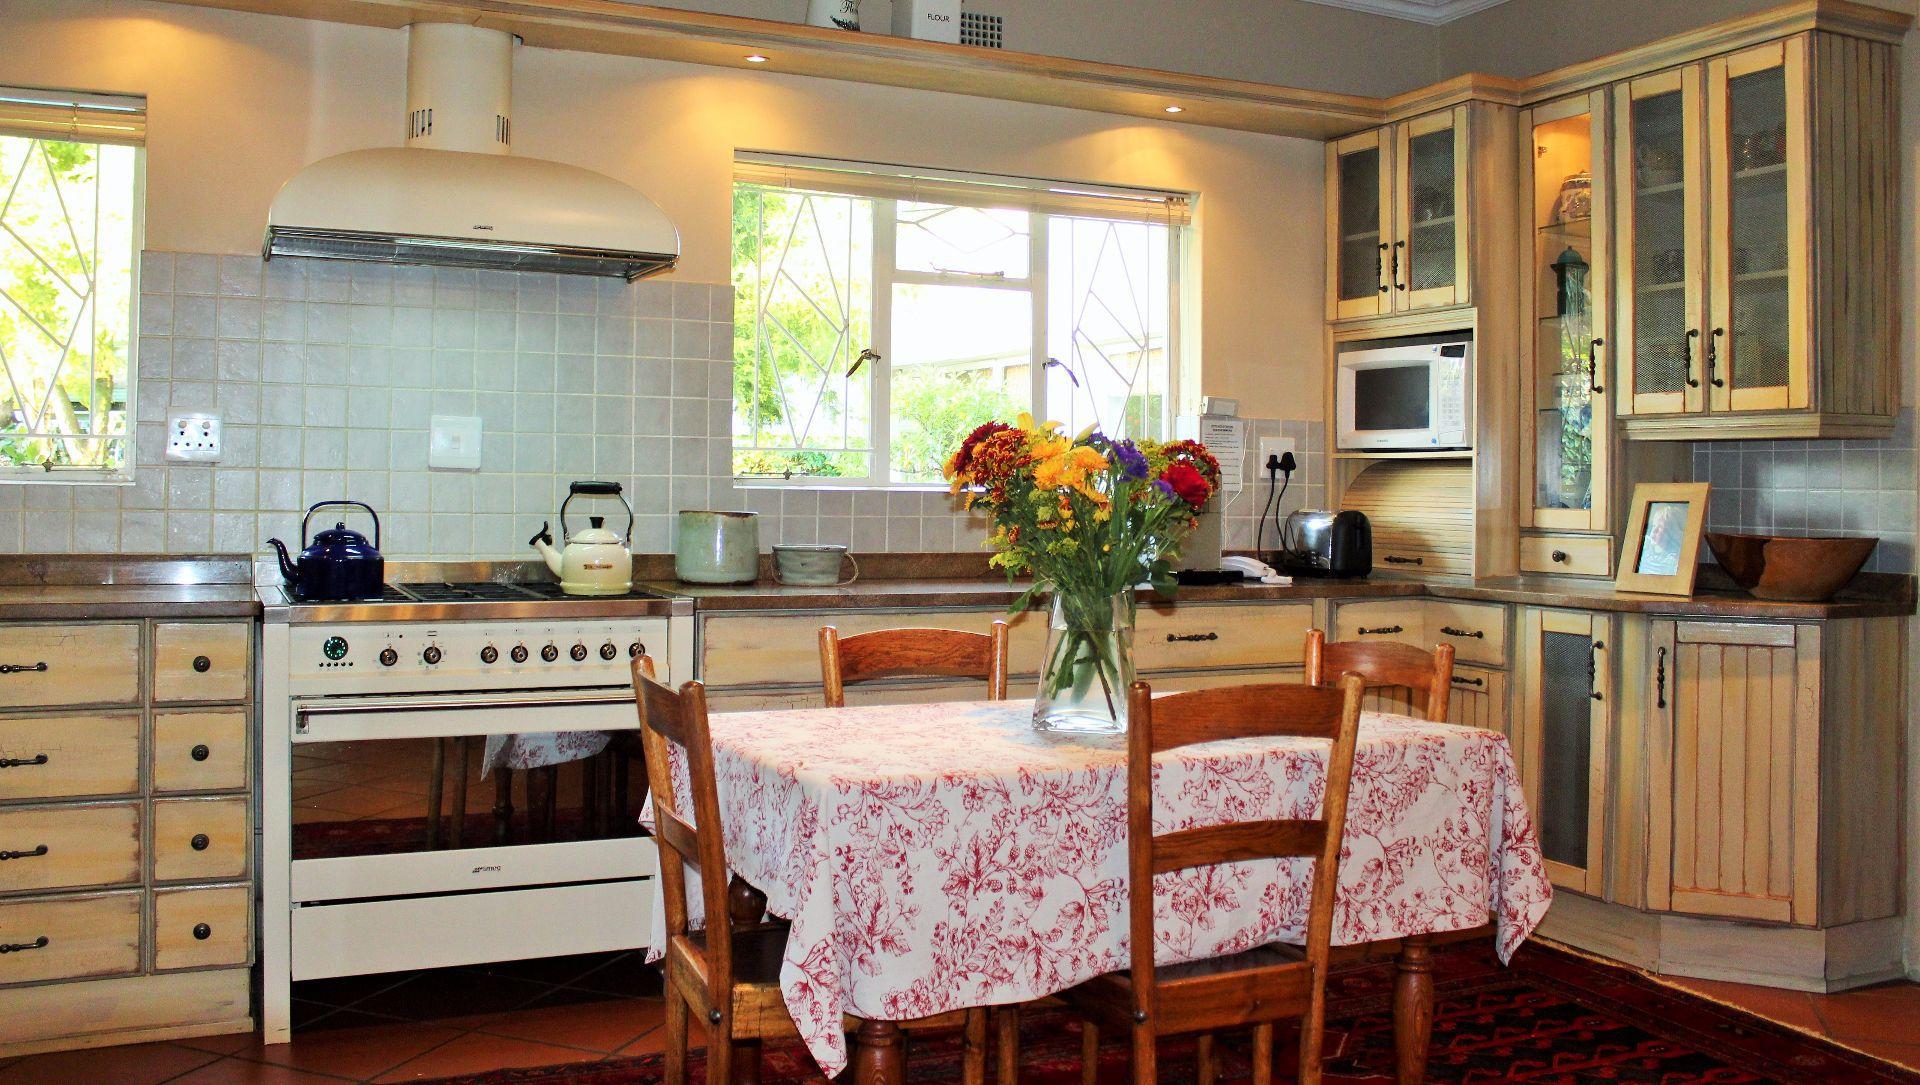 Heilige Akker property for sale. Ref No: 13540532. Picture no 8